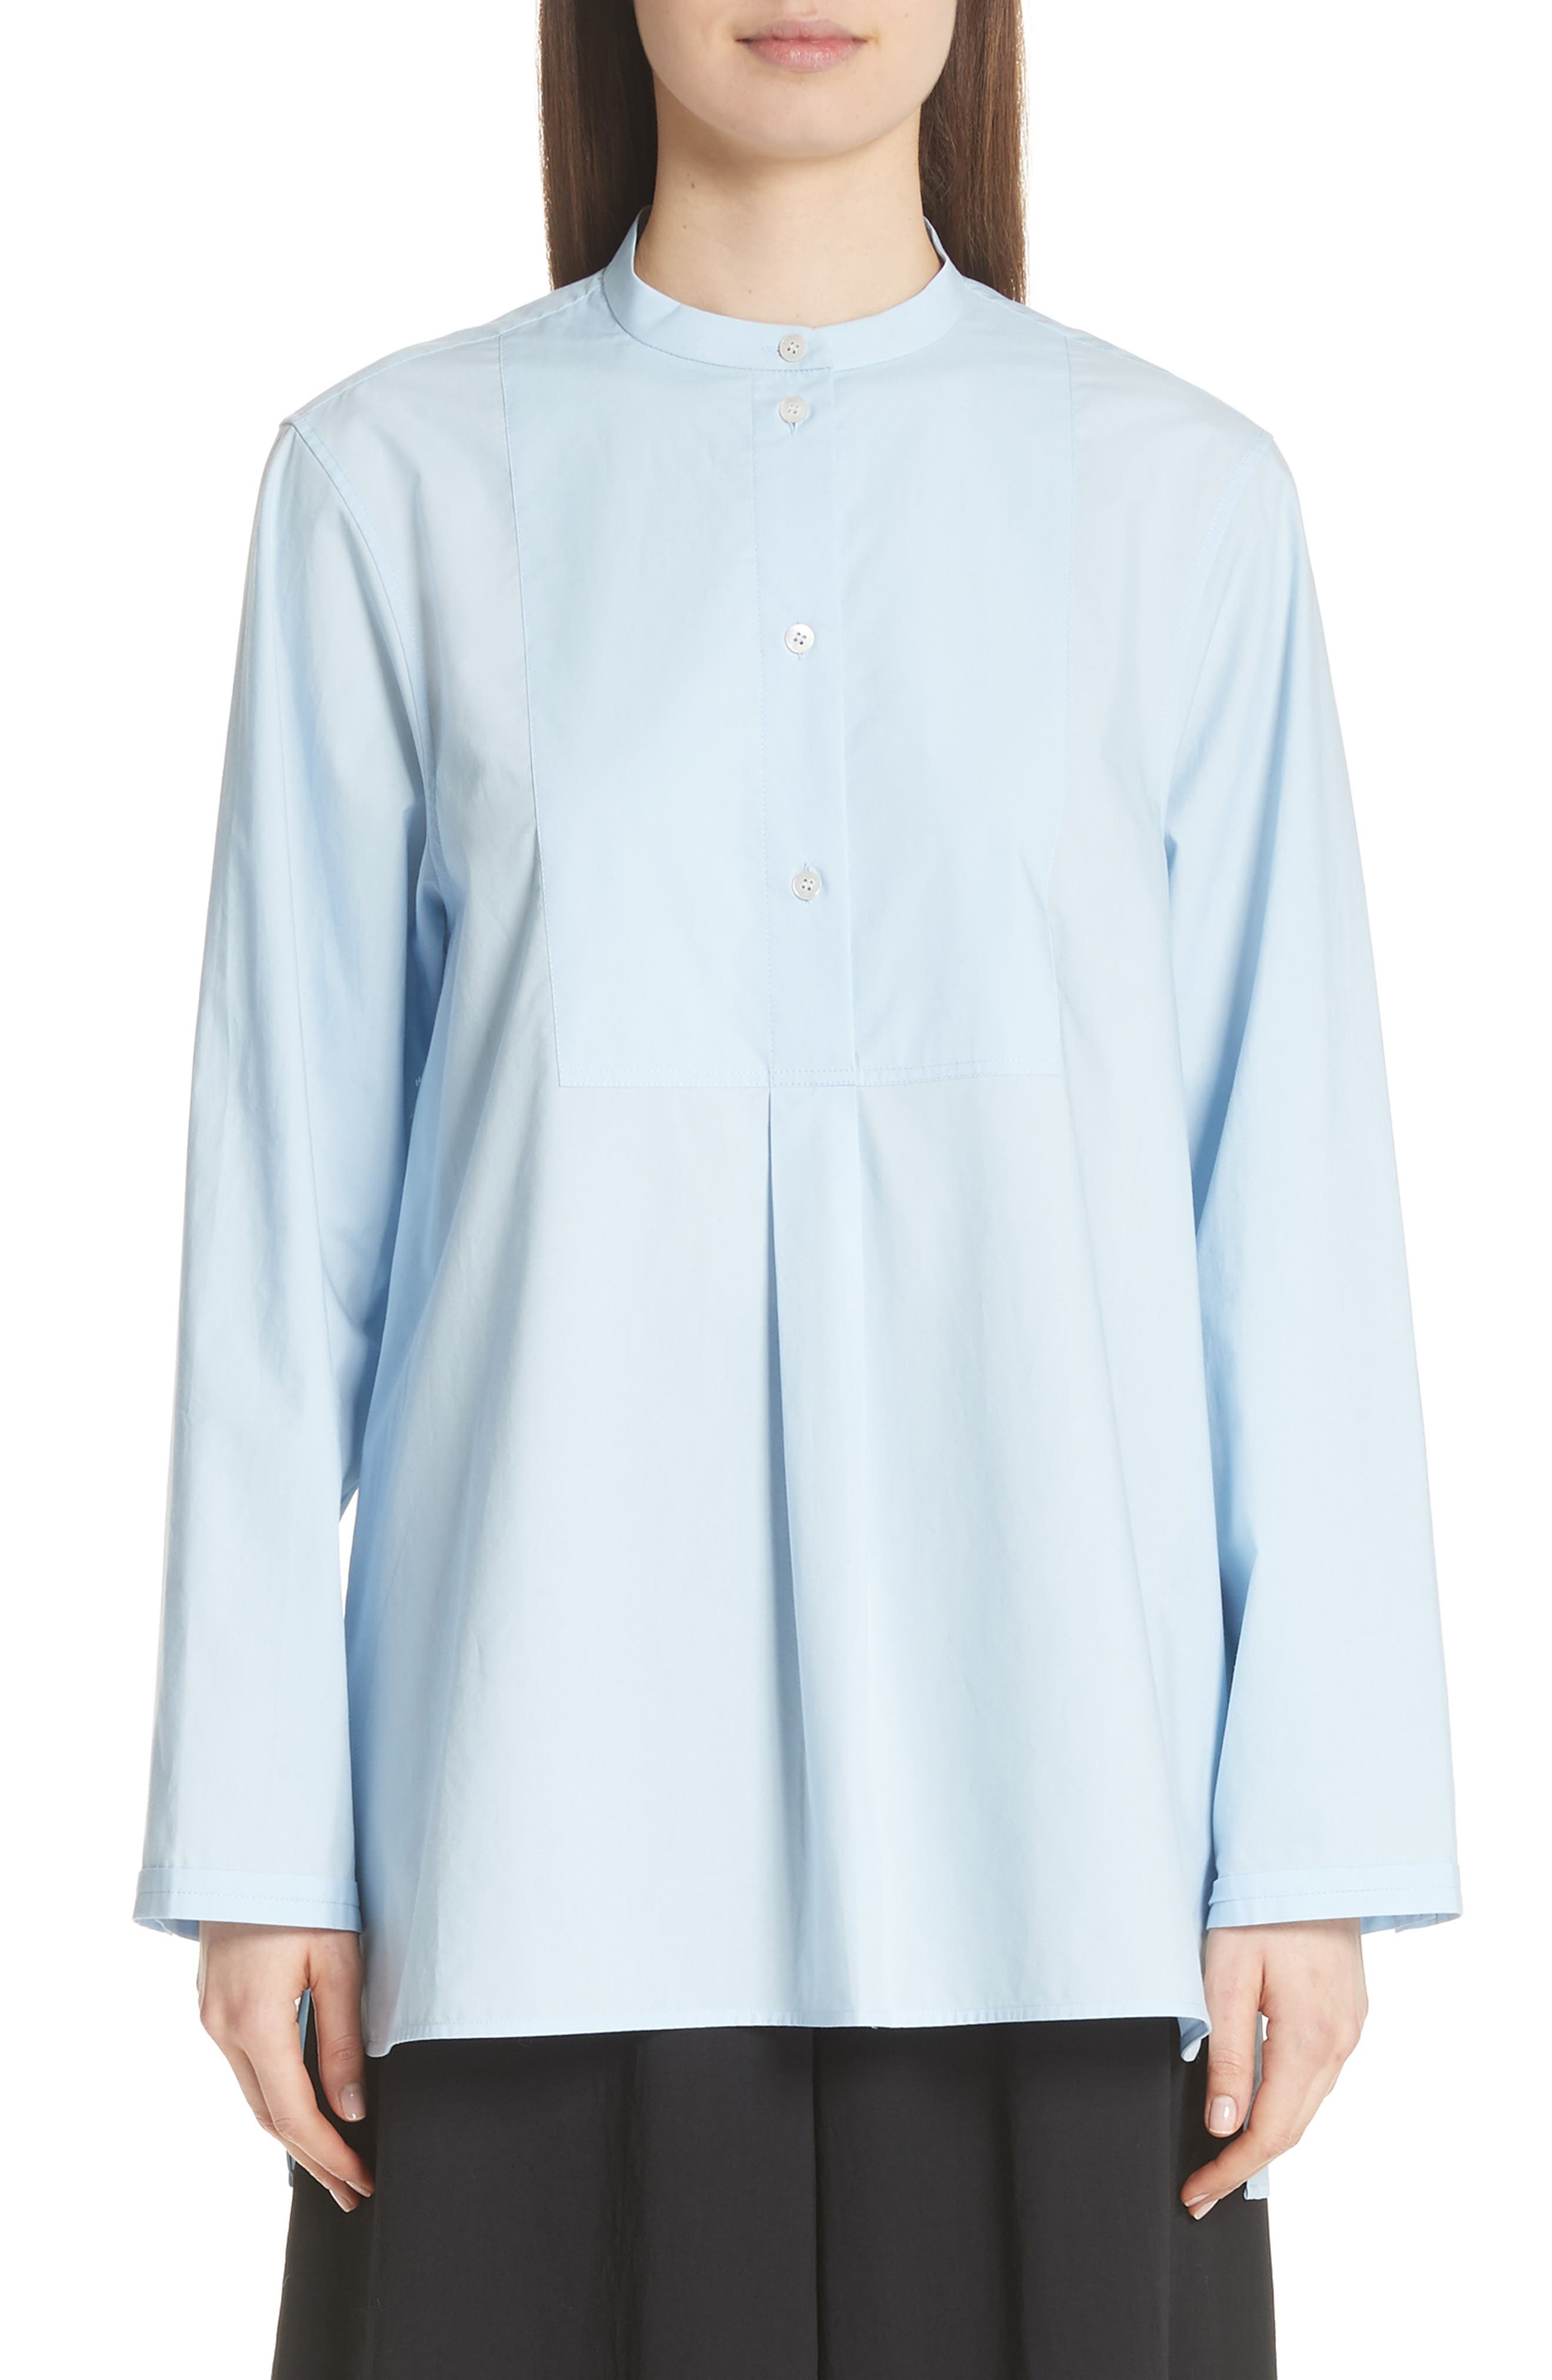 Acne Studios Lysanne Poplin Shirt